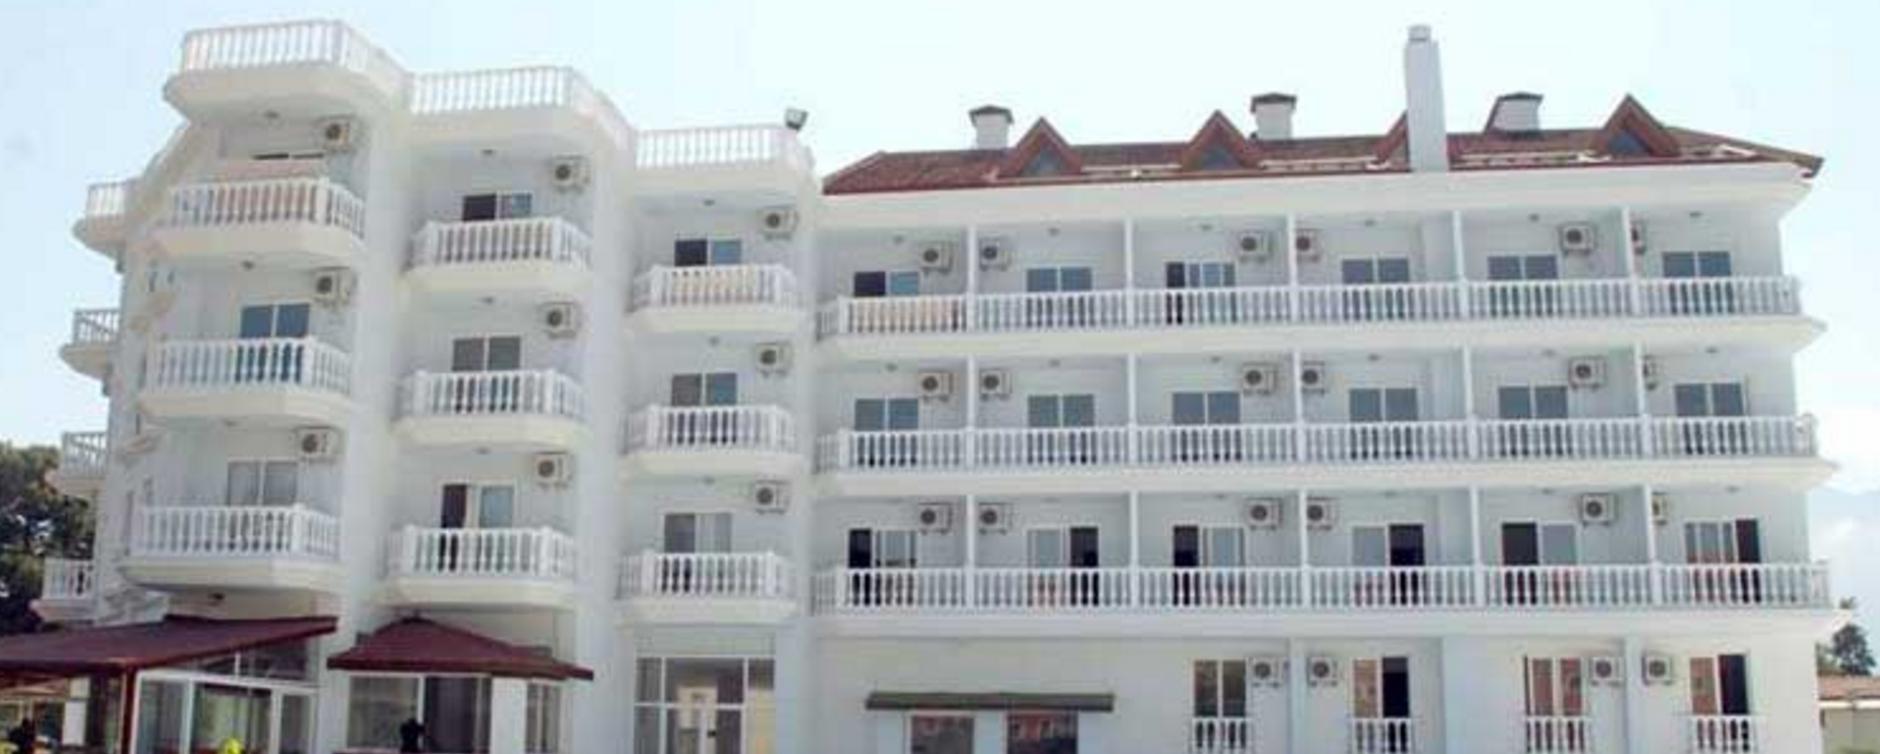 Hotel Adalin Resort 4 (Turkey, Kemer): photos, description, service and reviews of tourists 83